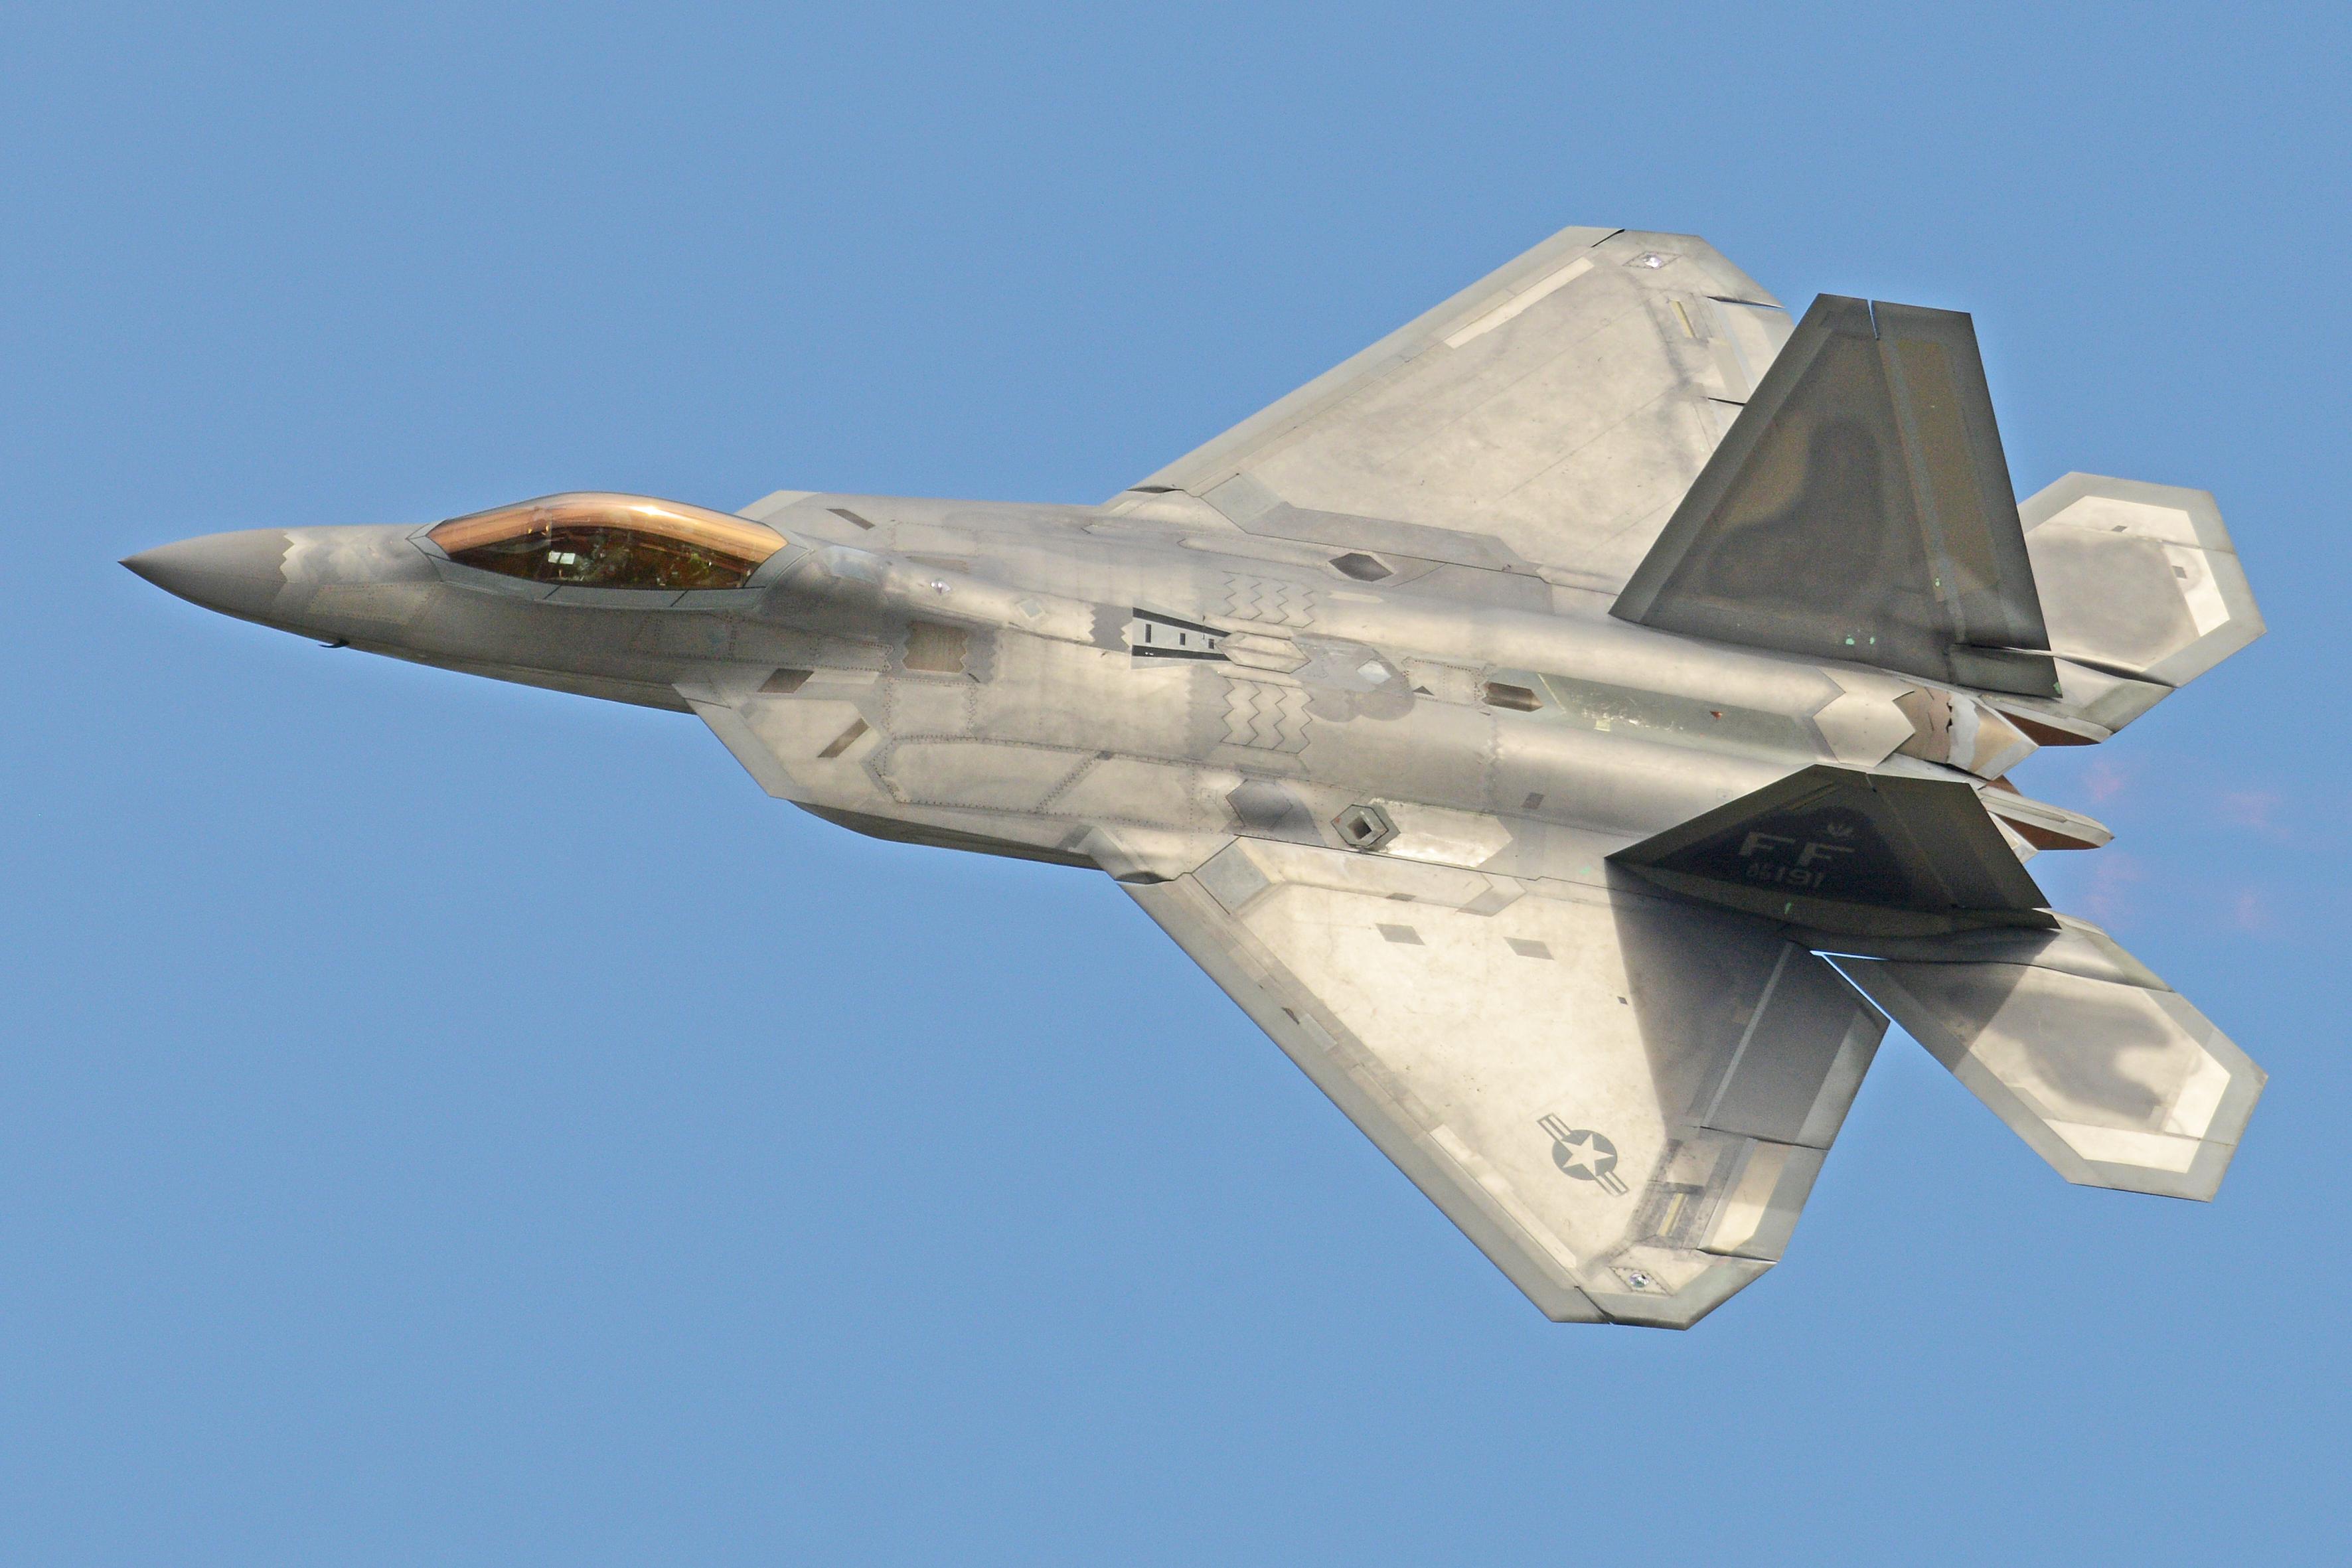 File:Lockheed Martin F-22 Raptor '09-191 - FF' (27585274634).jpg - Wikimedia Commons